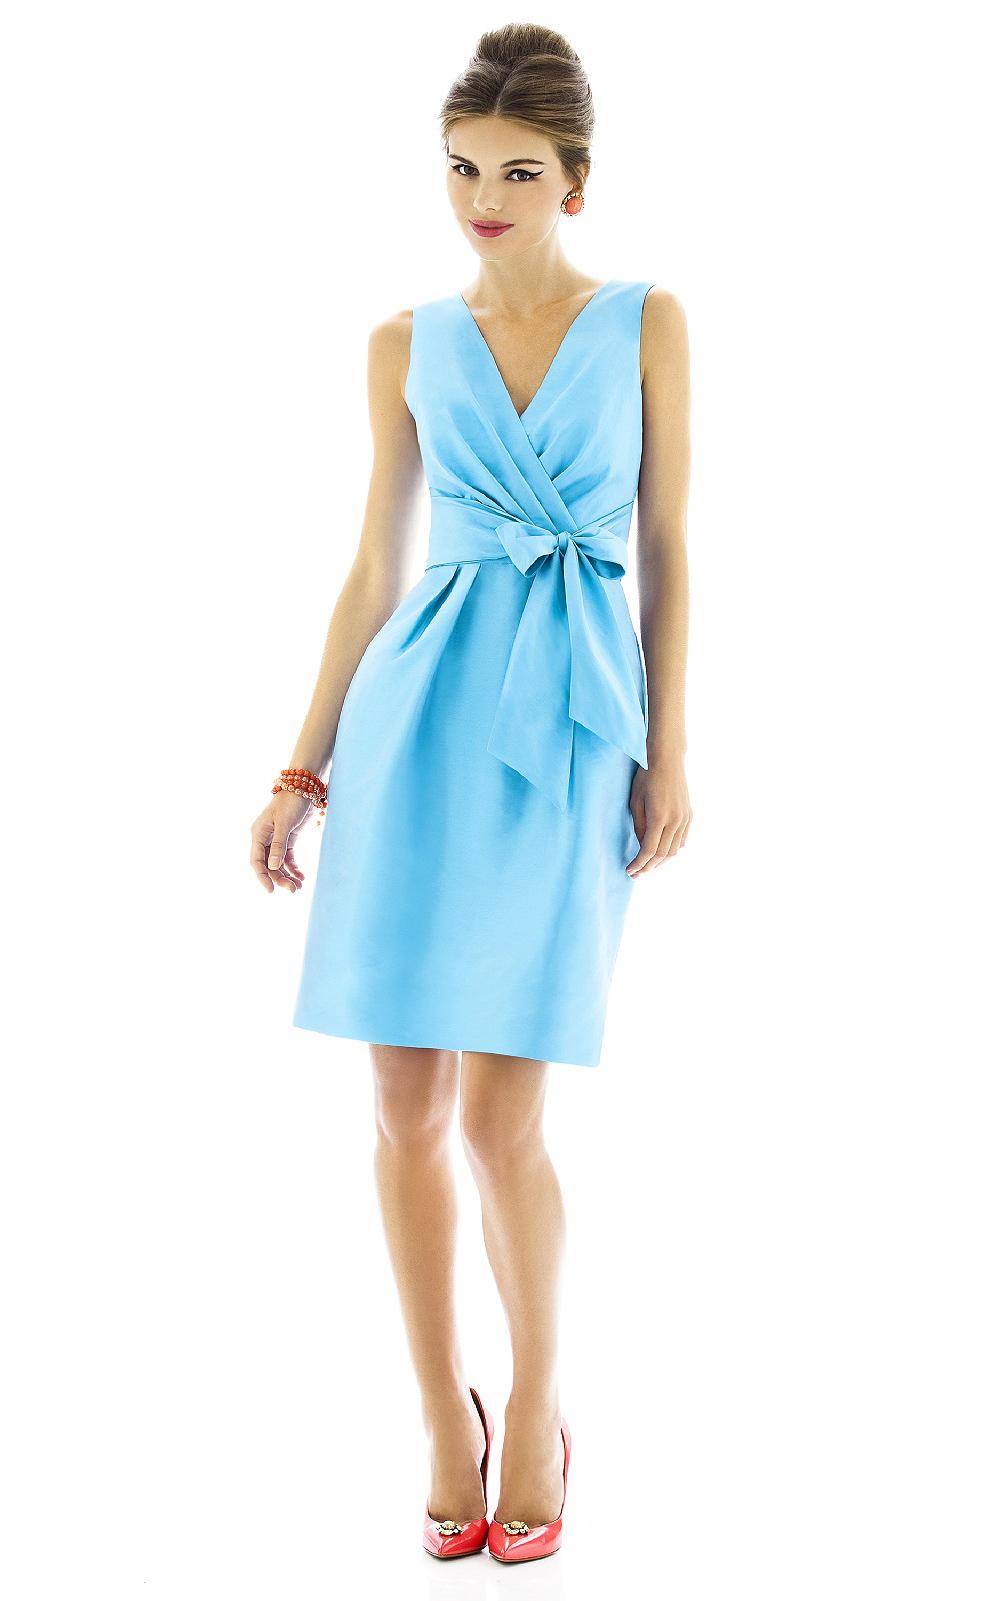 http://www.aislestyle.co.uk/zipper-kneelength-vneck-satin-sleeveless-bridesmaid-dresses-p-5481.html